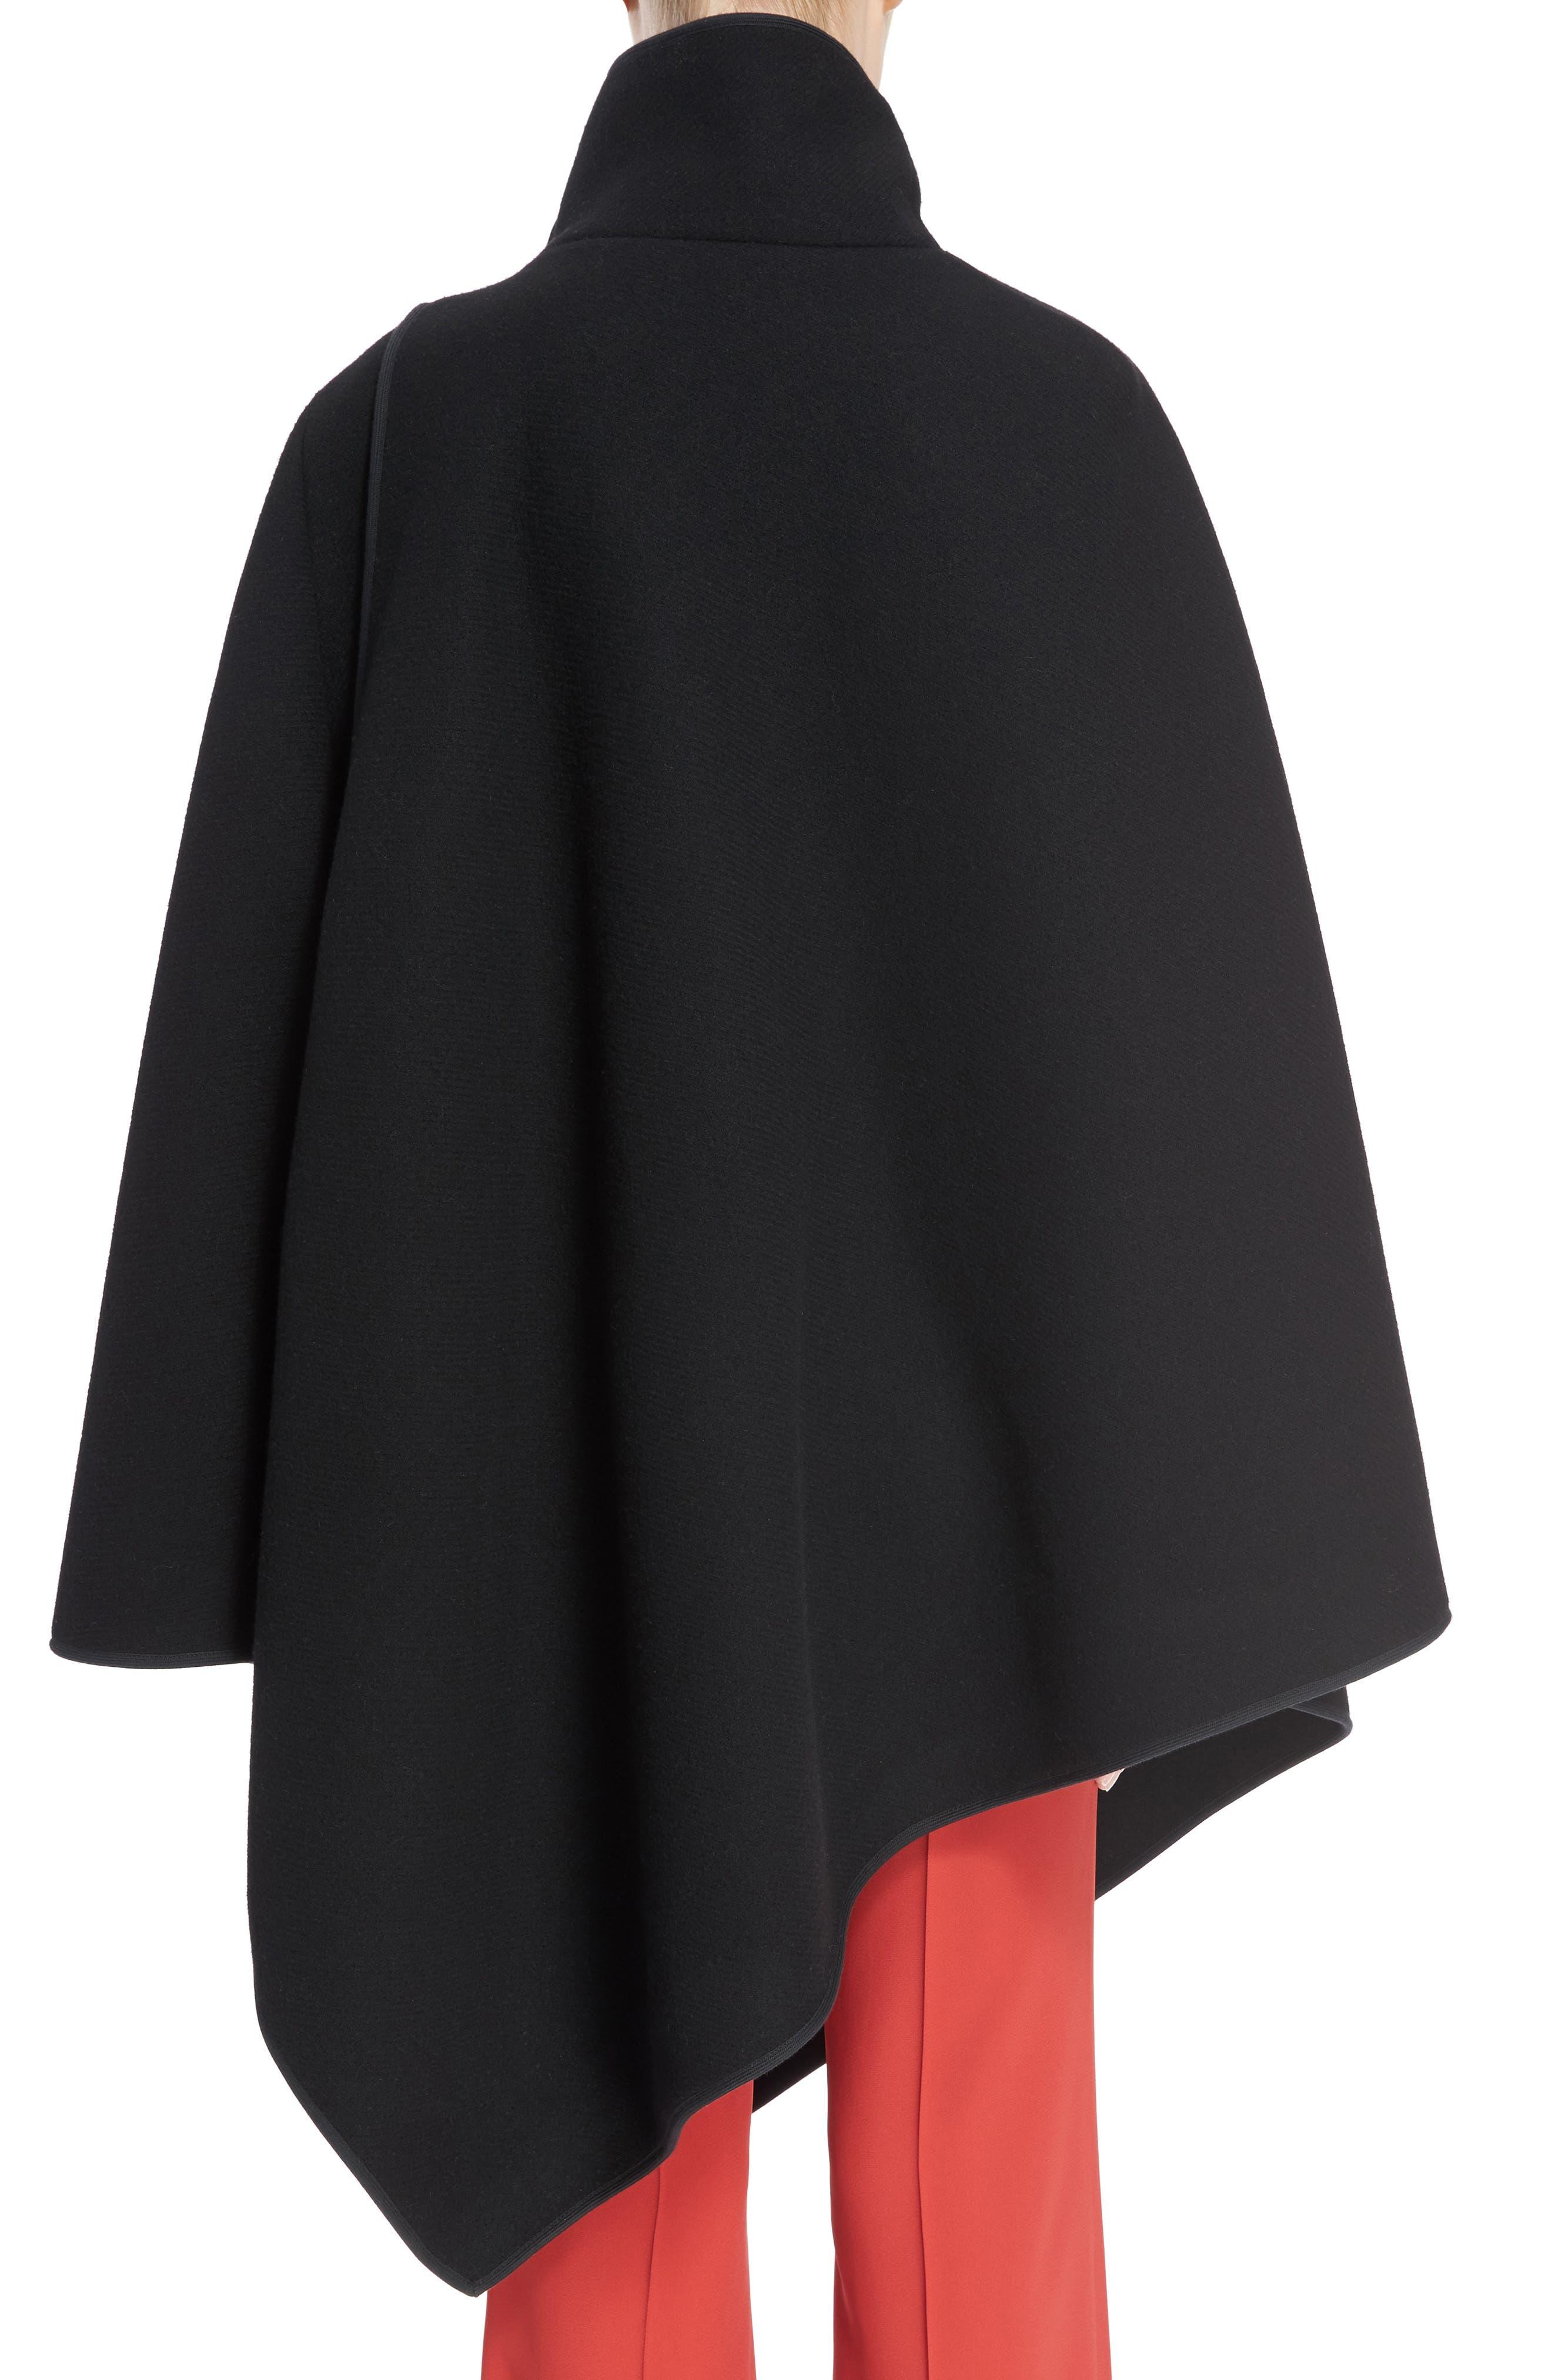 Virgin Wool Blend Poncho,                             Alternate thumbnail 2, color,                             Black